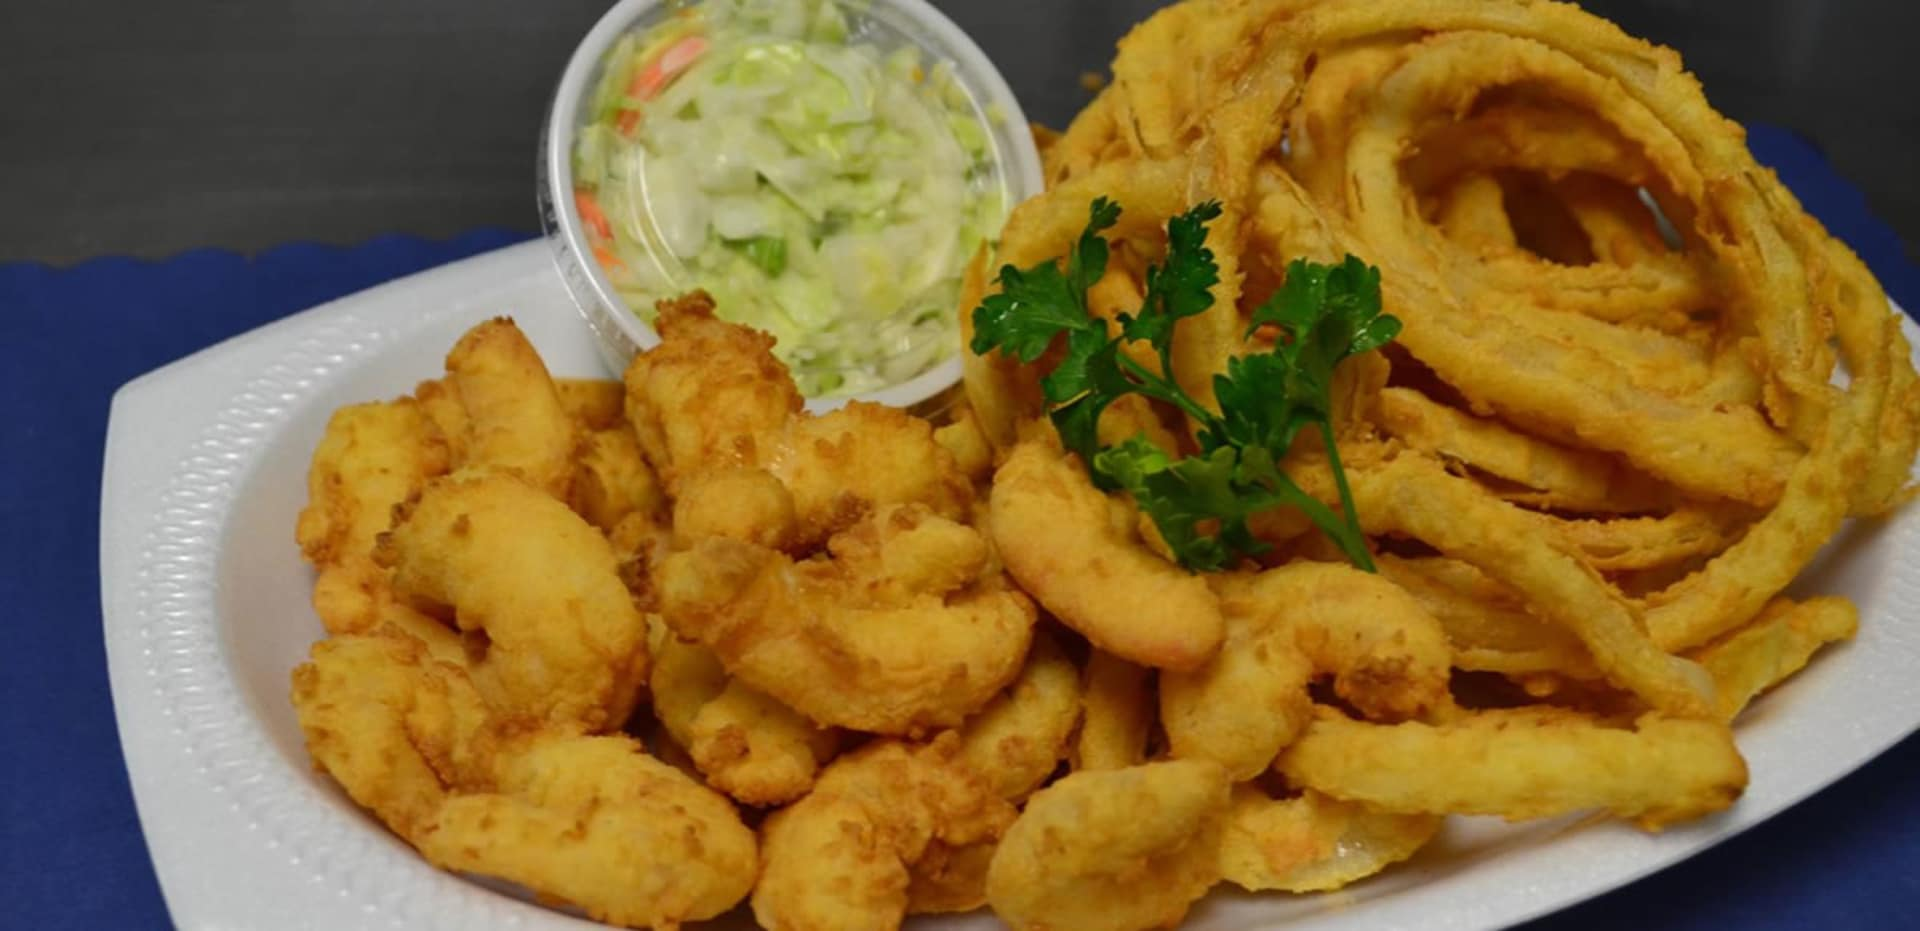 Welcome to Seafood Sam's